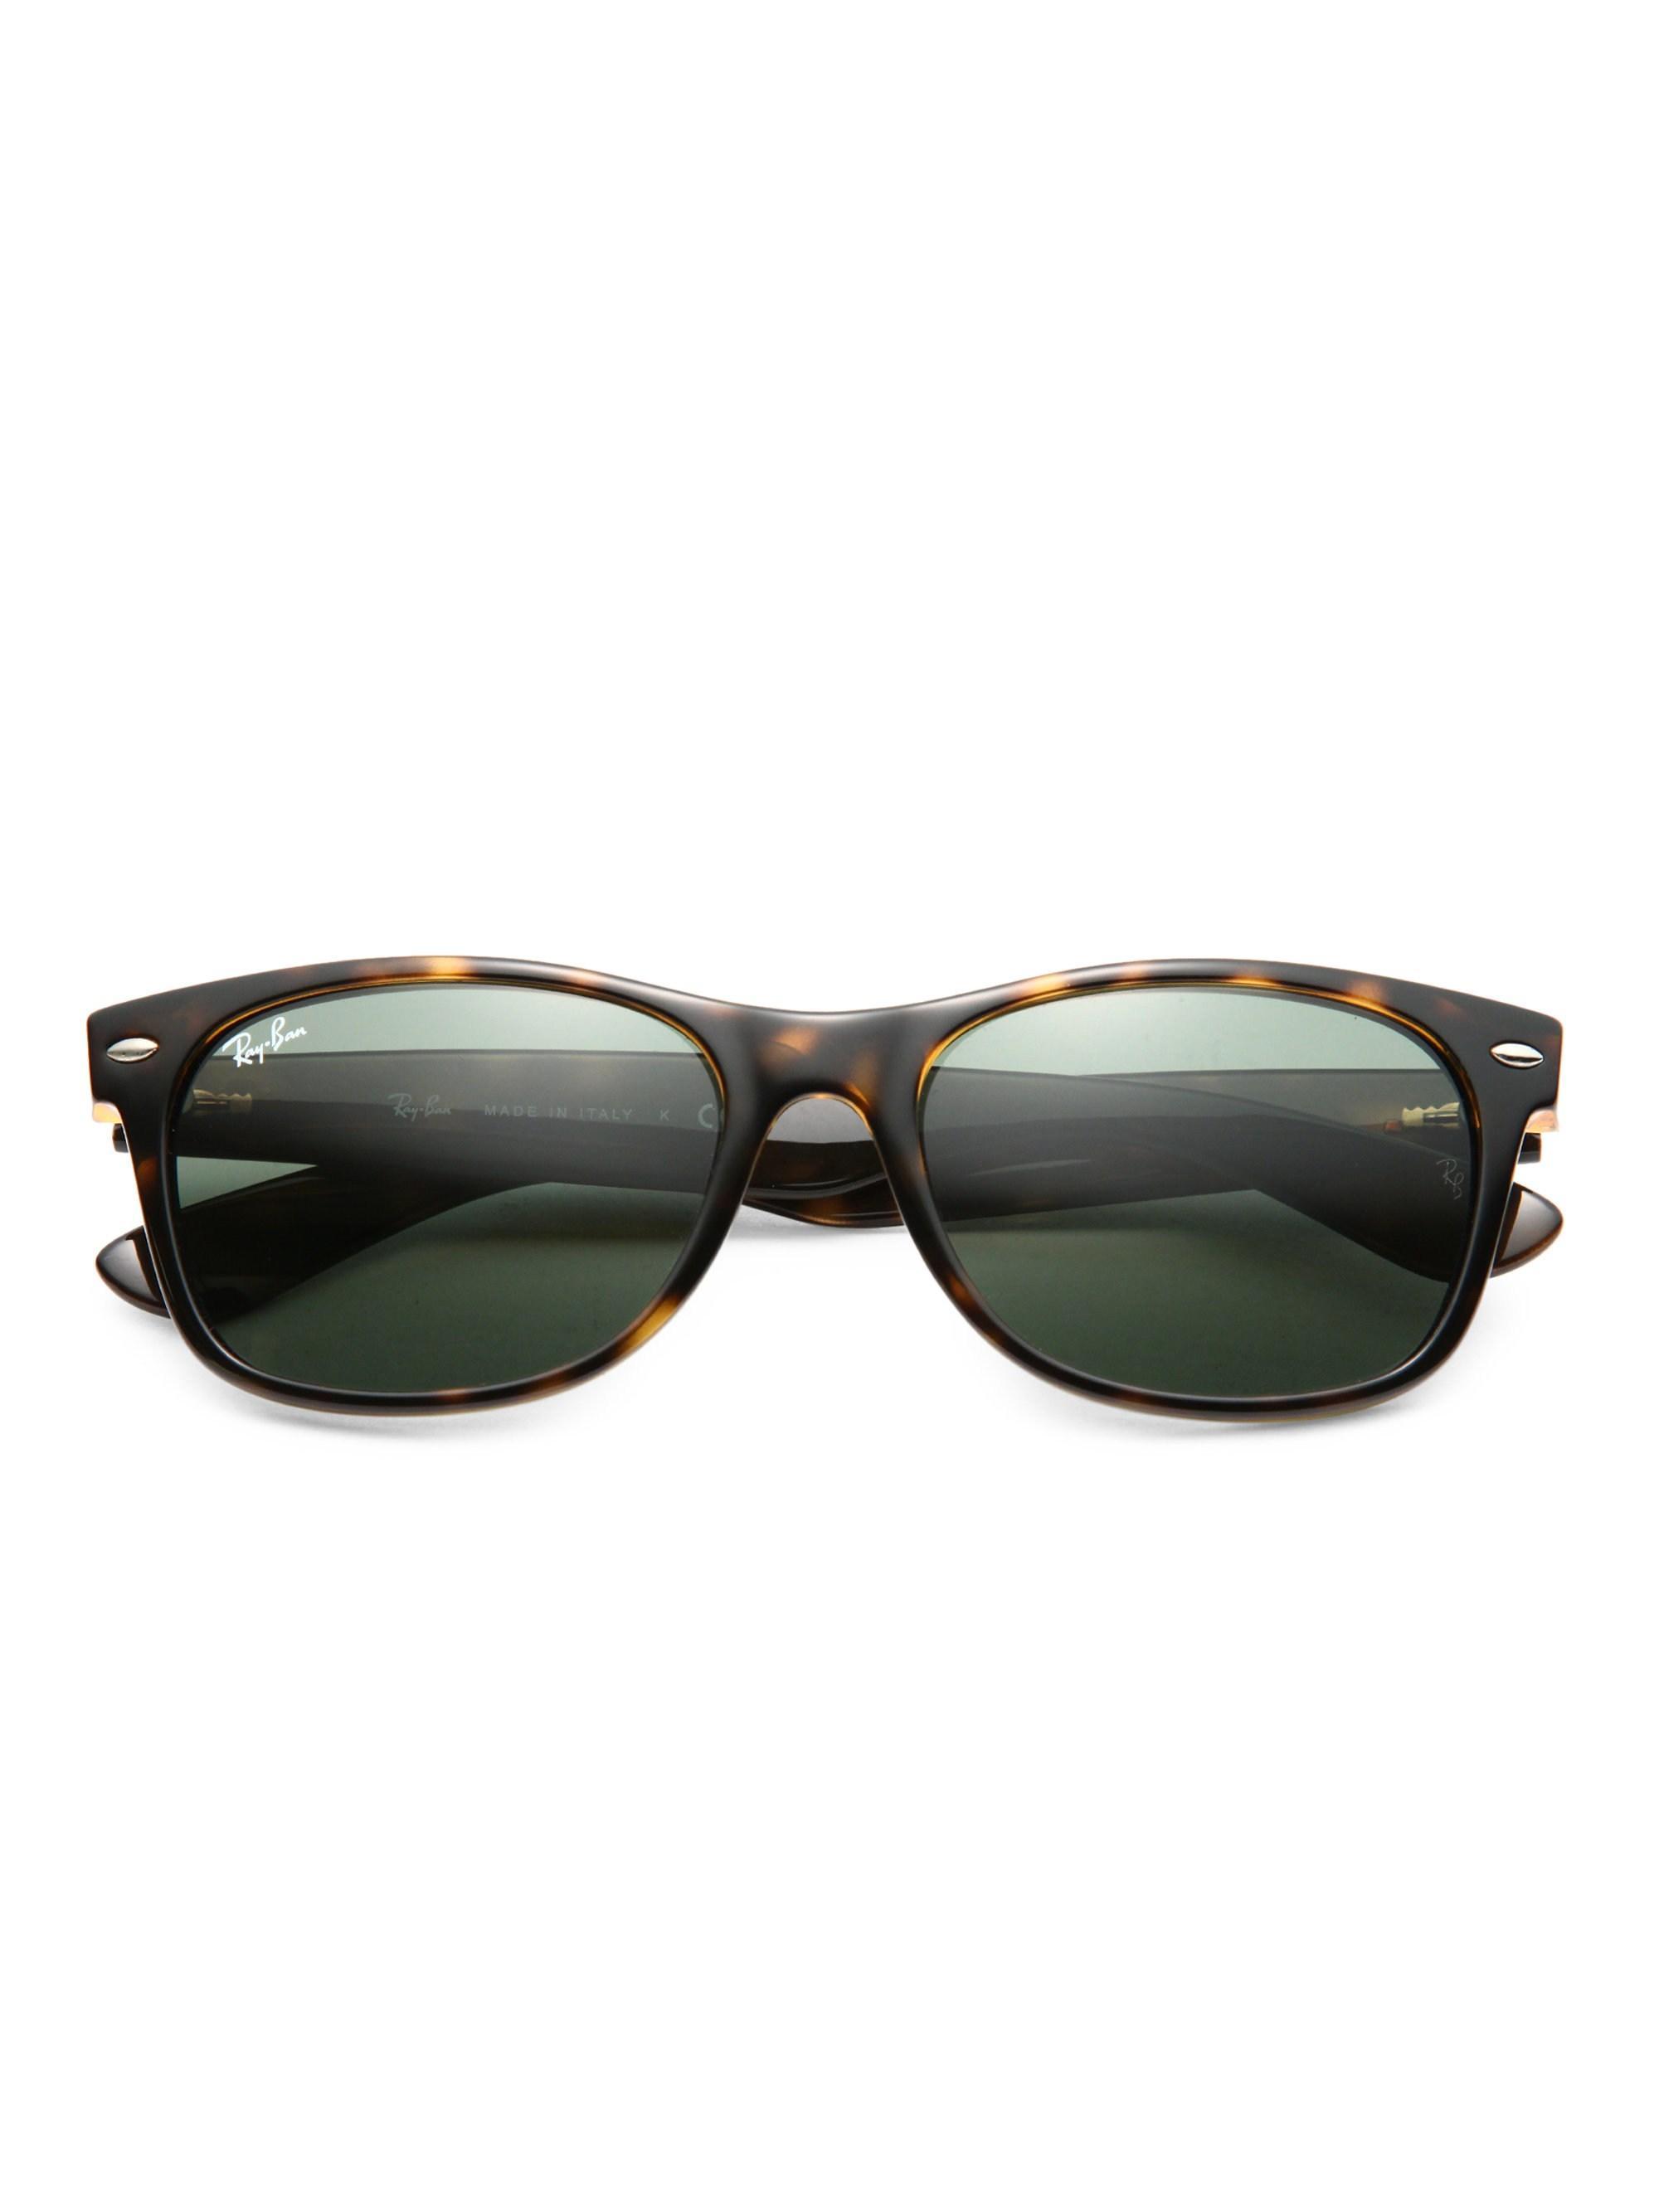 b3304672ef Lyst - Ray-Ban 55mm New Wayfarer Sunglasses in Black for Men